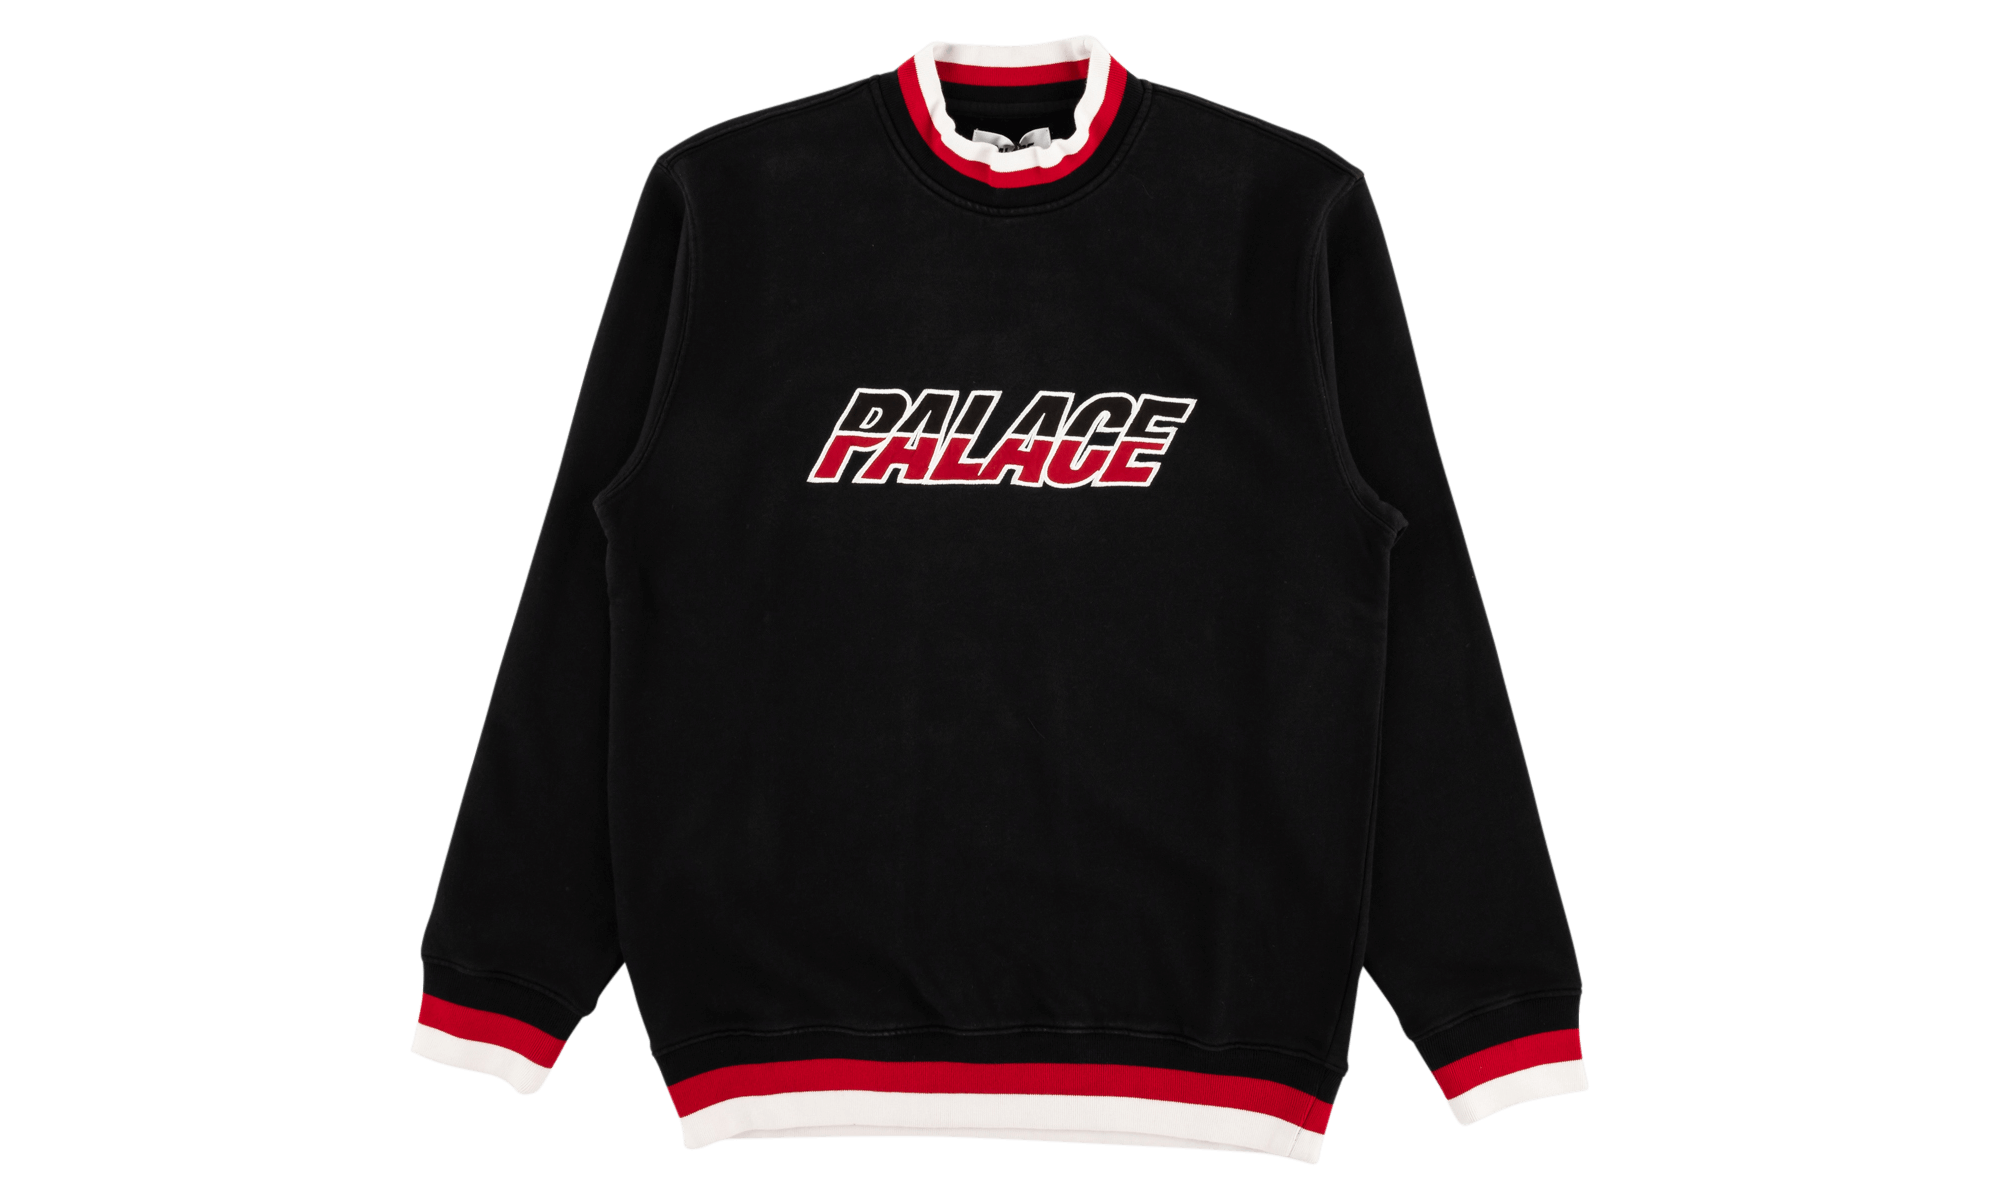 Palace x adidas Originals Fleece Crew | Gray | Crewnecks